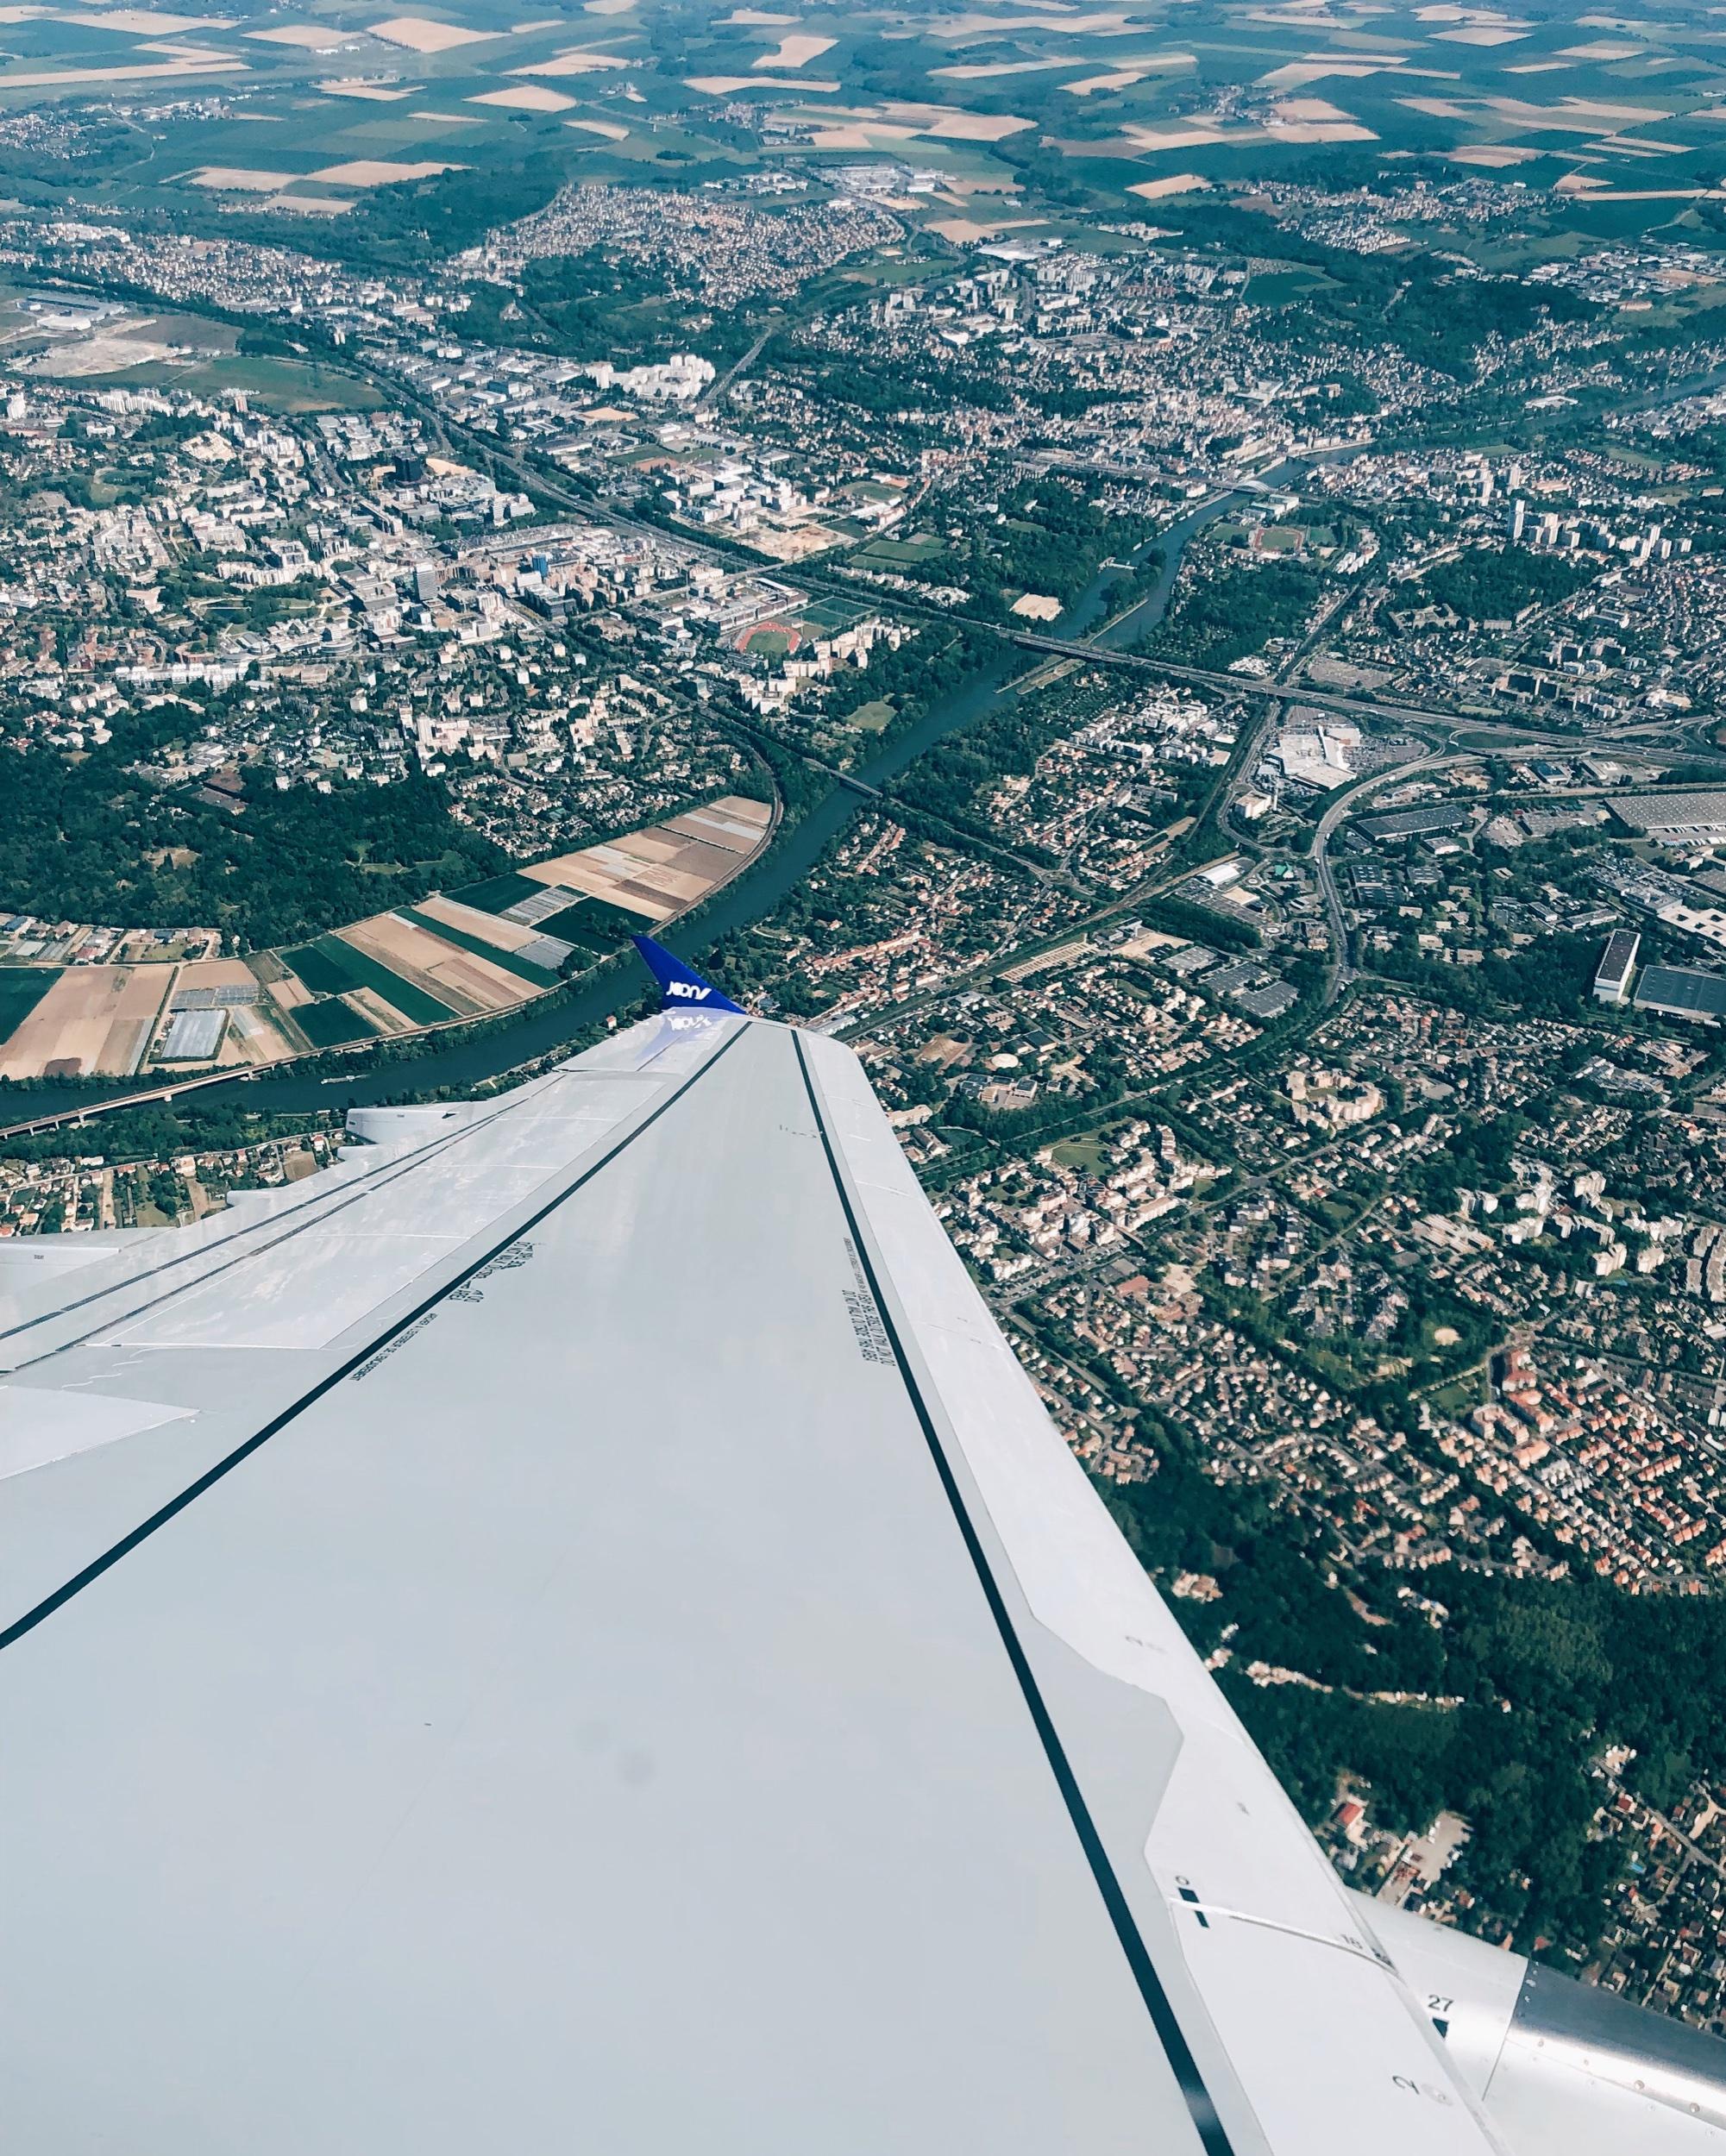 Air France PRG - CDG